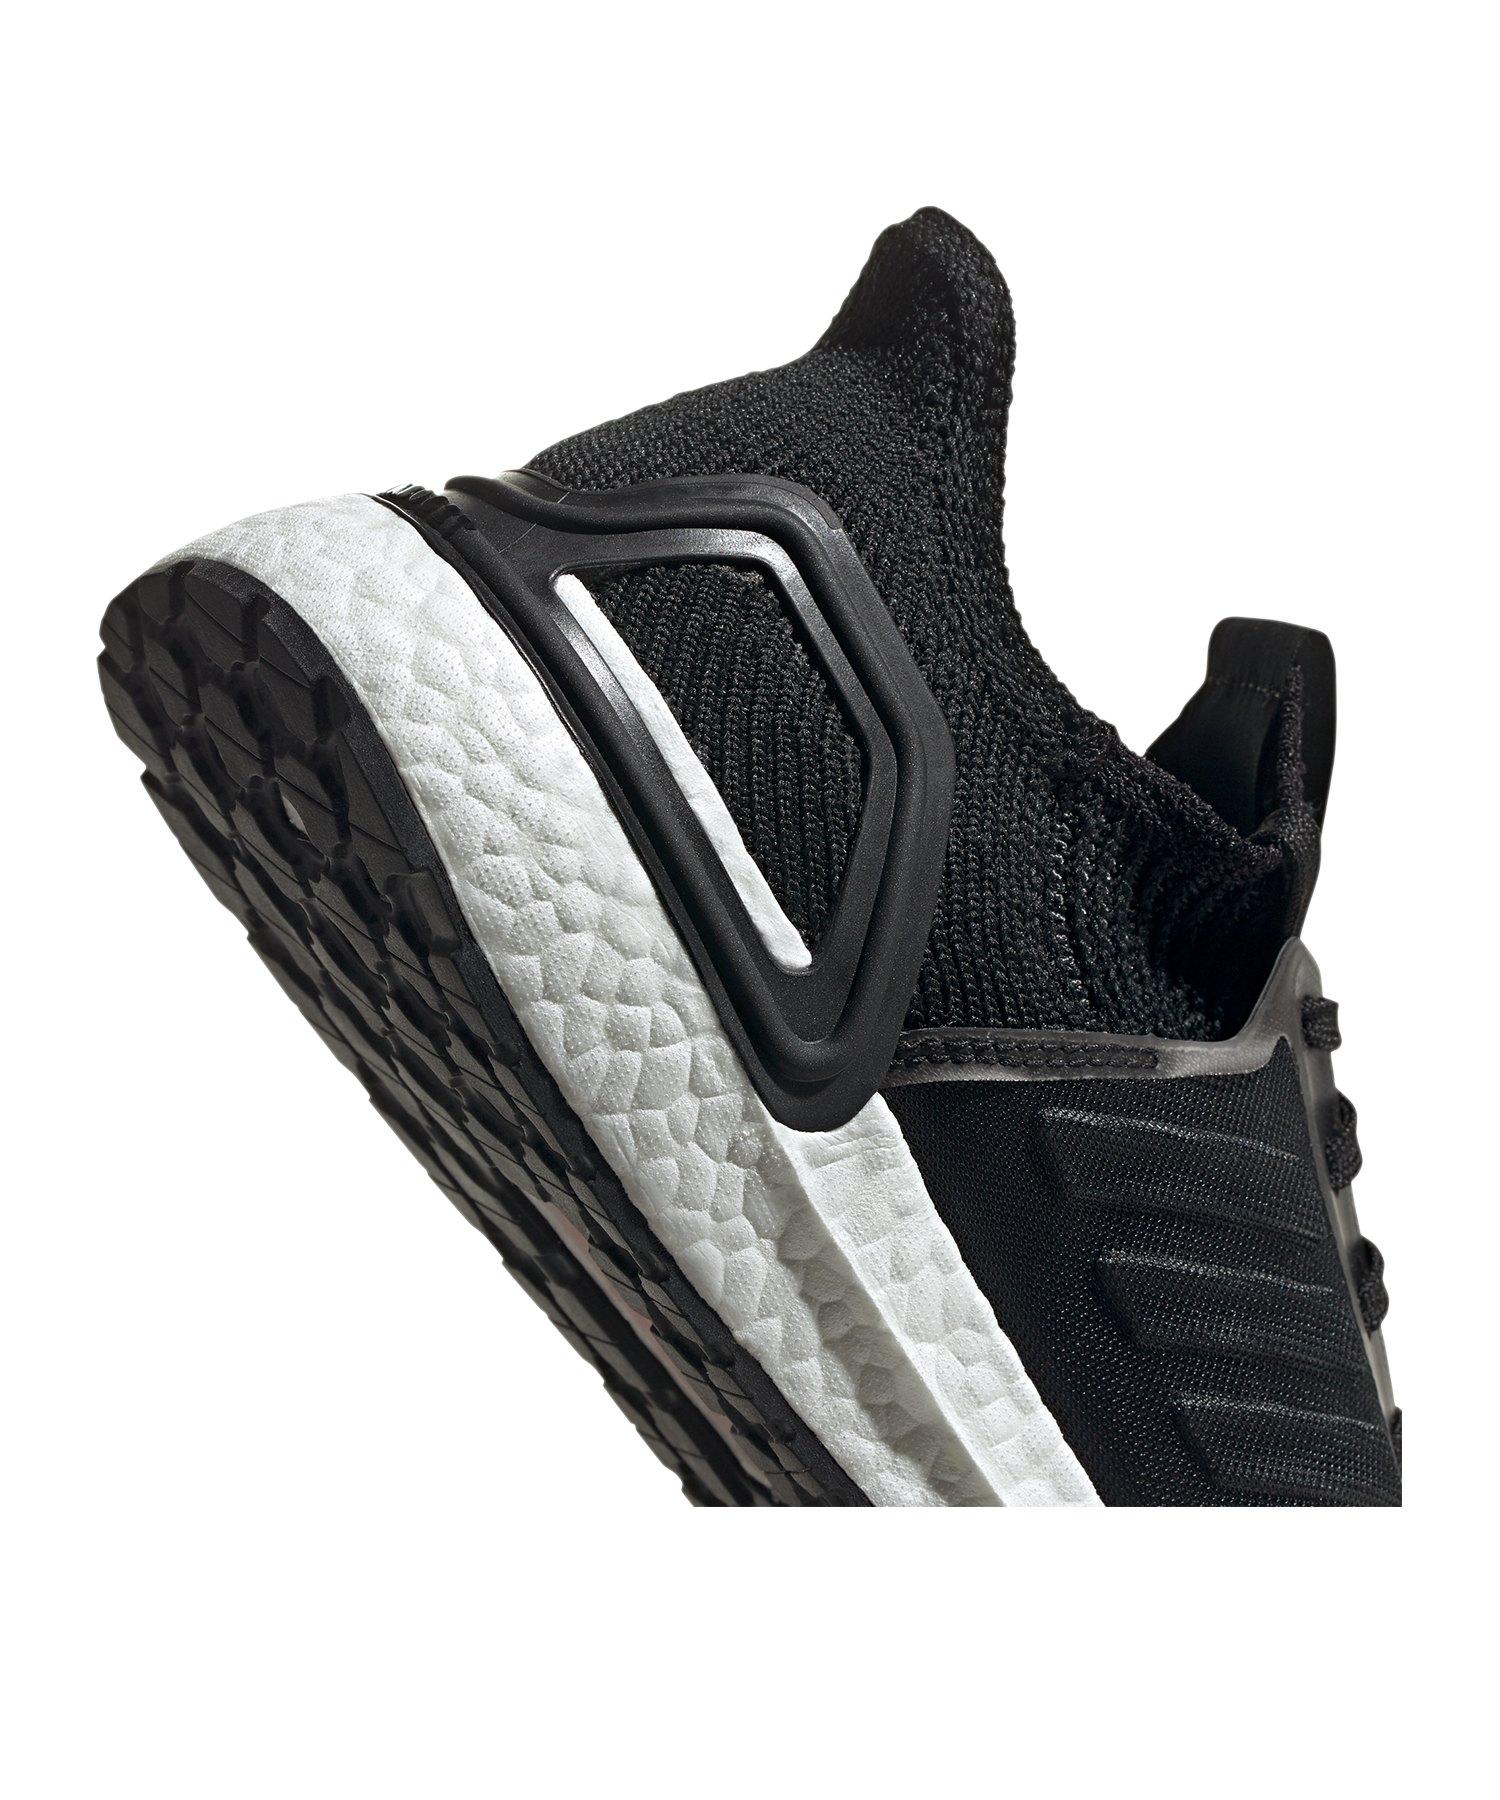 adidas Ultra Boost 19 Running Damen Schwarz